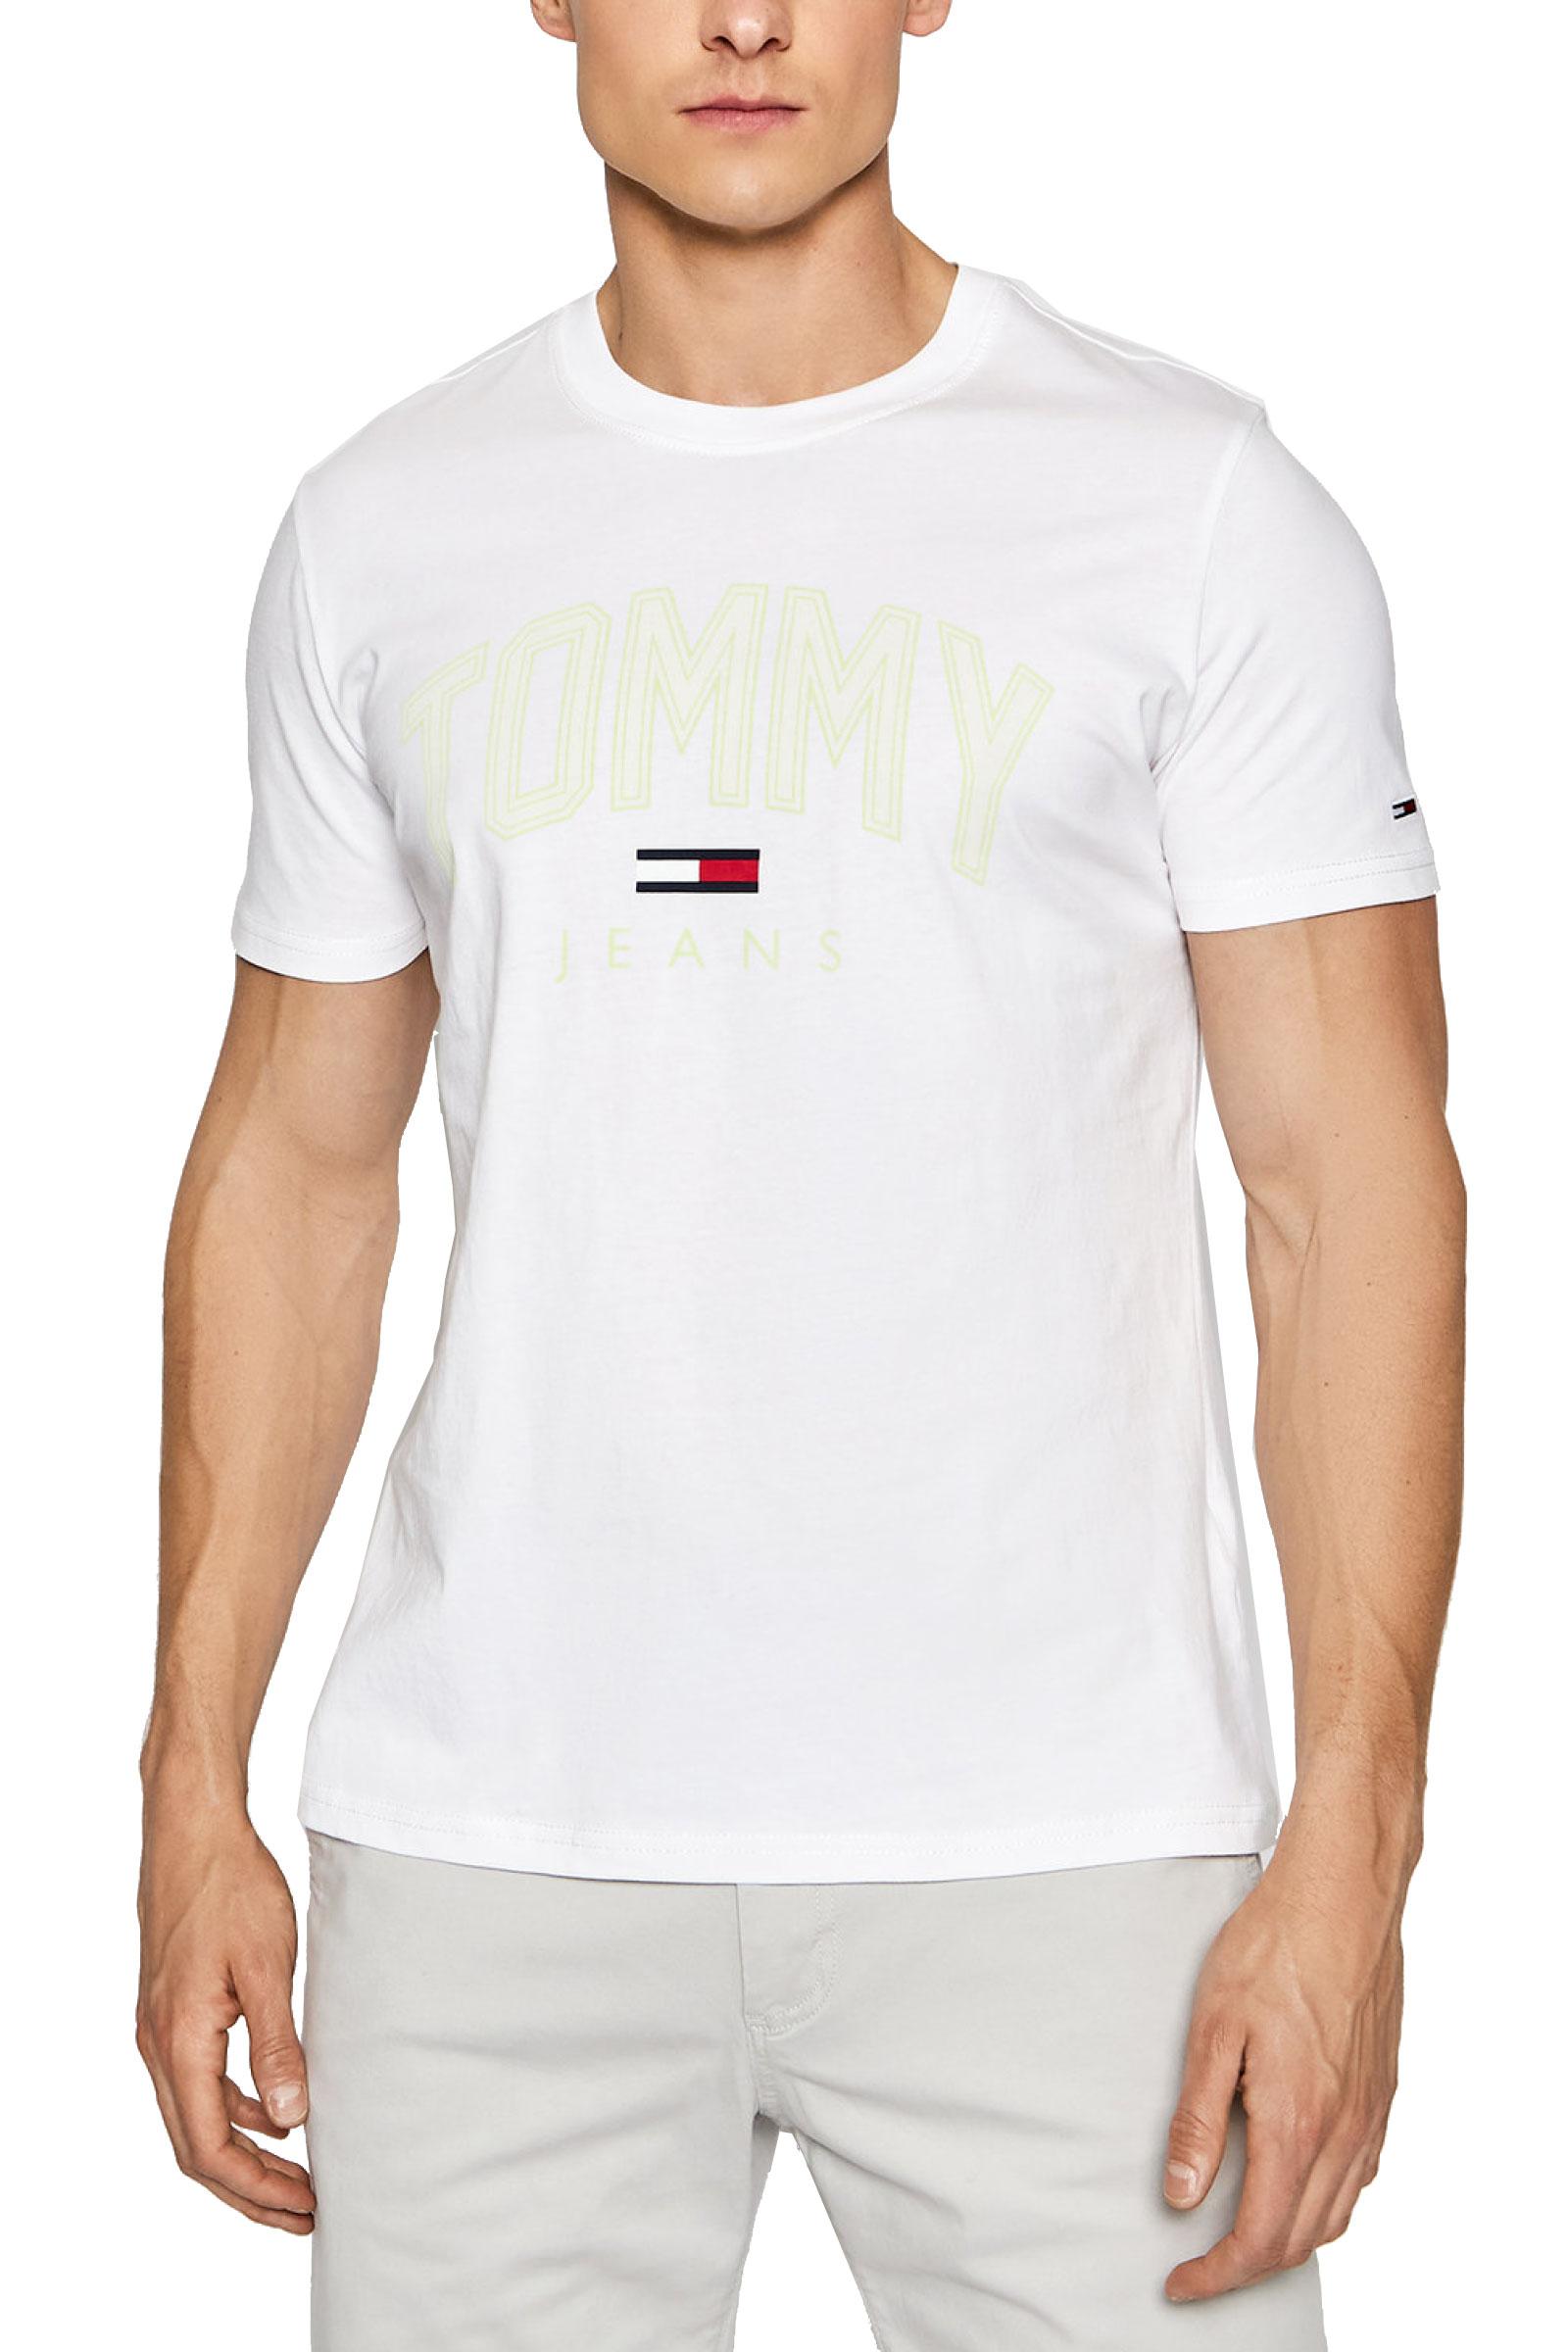 TOMMY JEANS | T-Shirt | DM0DM10226YBR